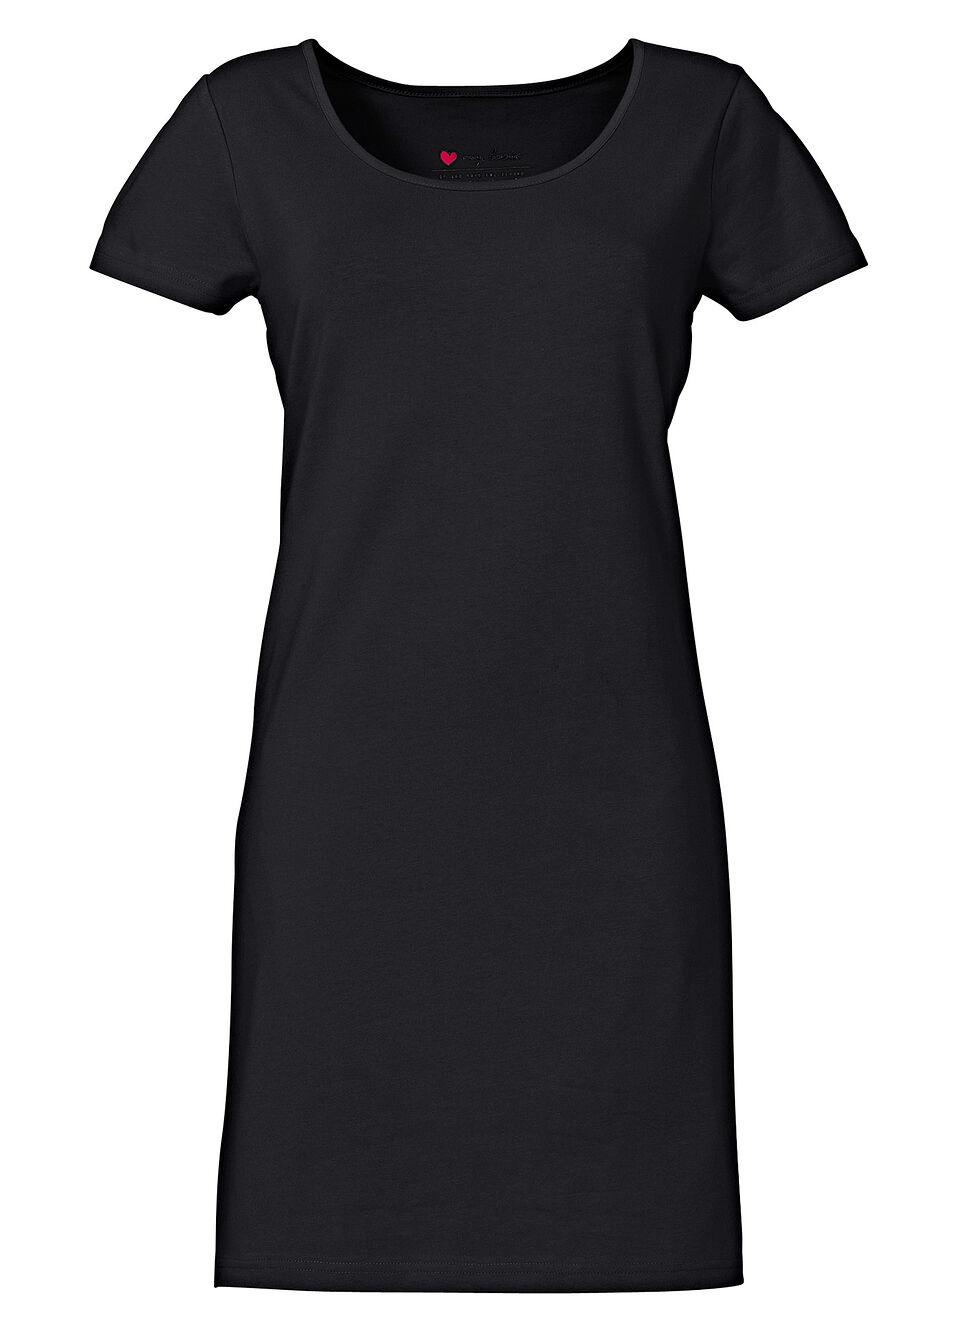 Платье стретч от bonprix